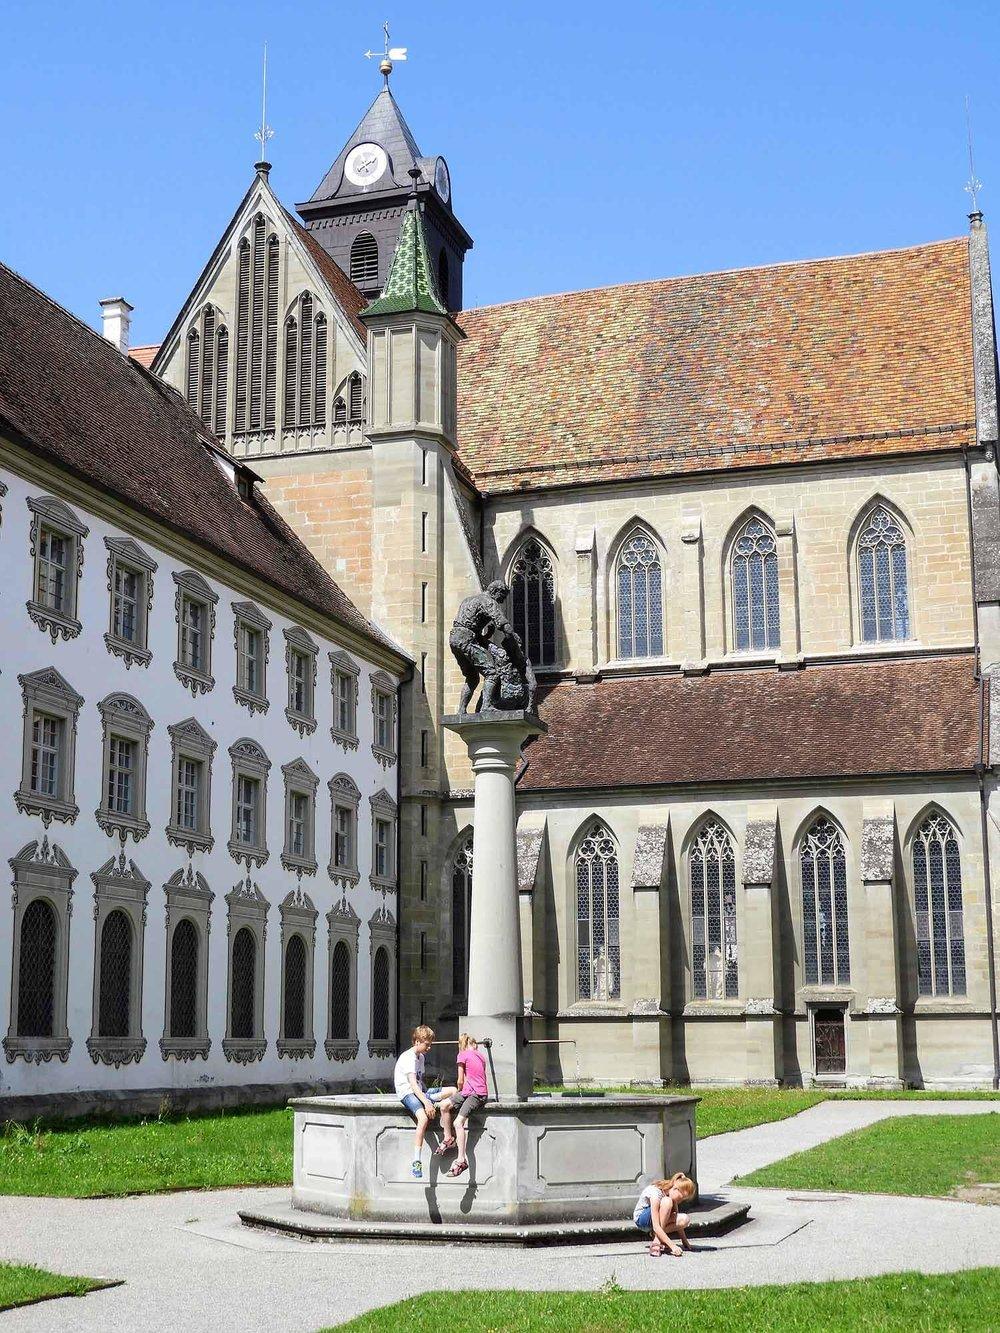 germany-salem-monastery-courtyard-well.jpg